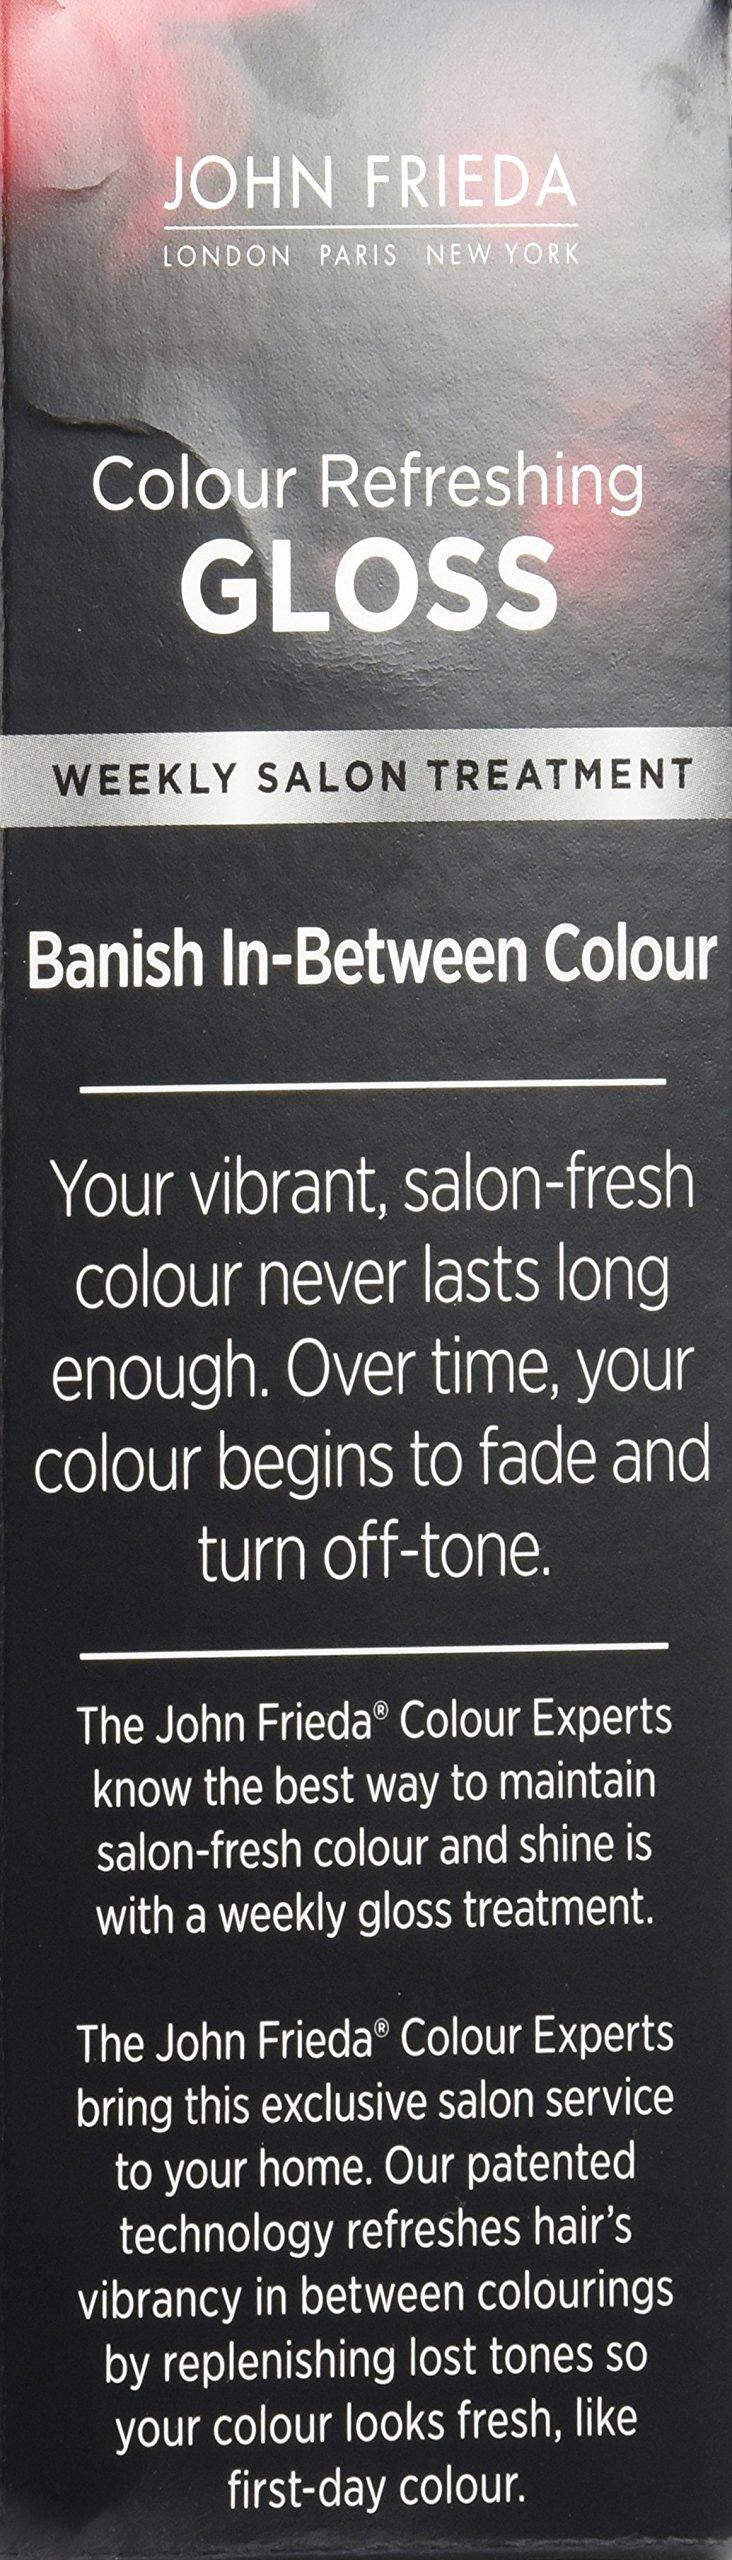 John Frieda Colour Refreshing Gloss, Warm Red, 6 Ounce by John Frieda PFC (Image #7)